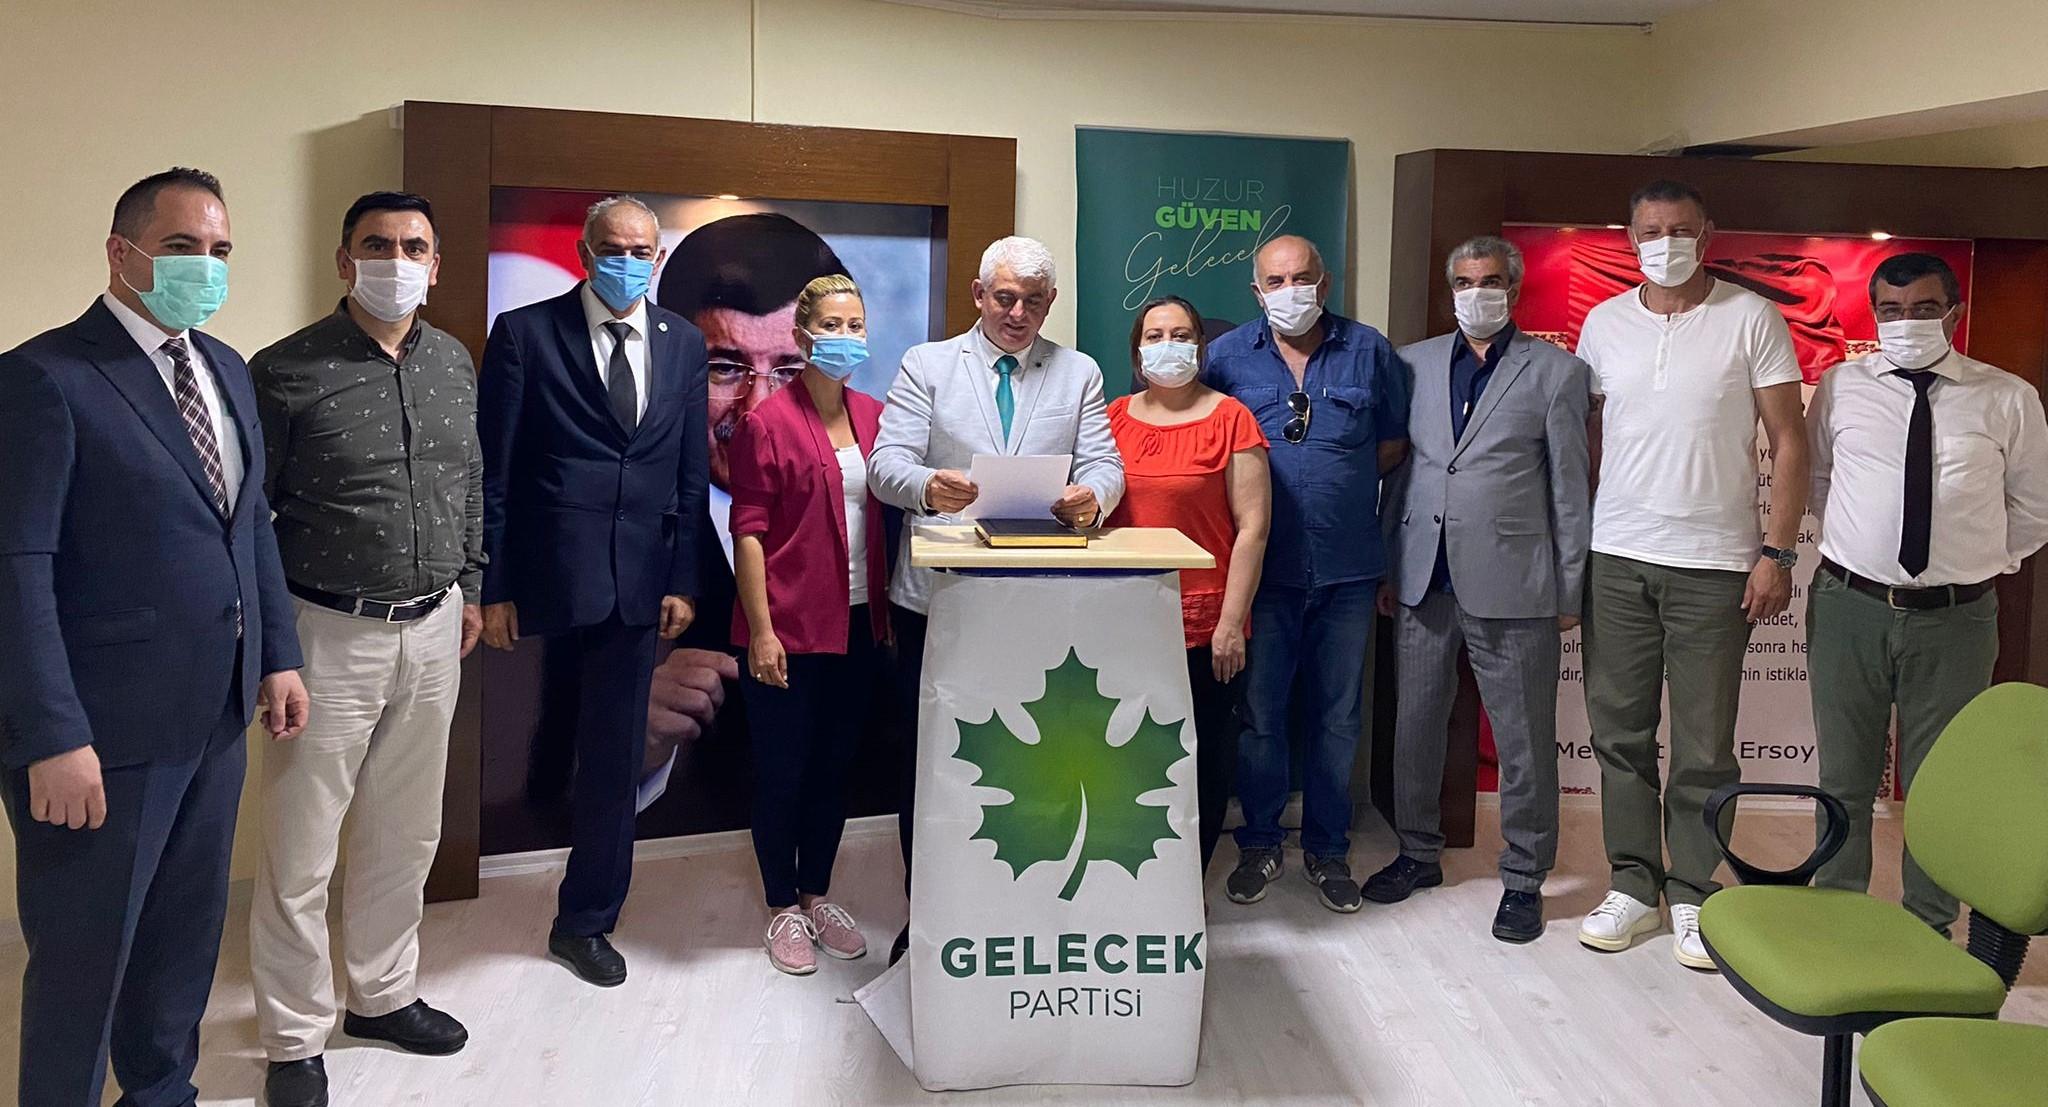 GELECEK PARTİSİ